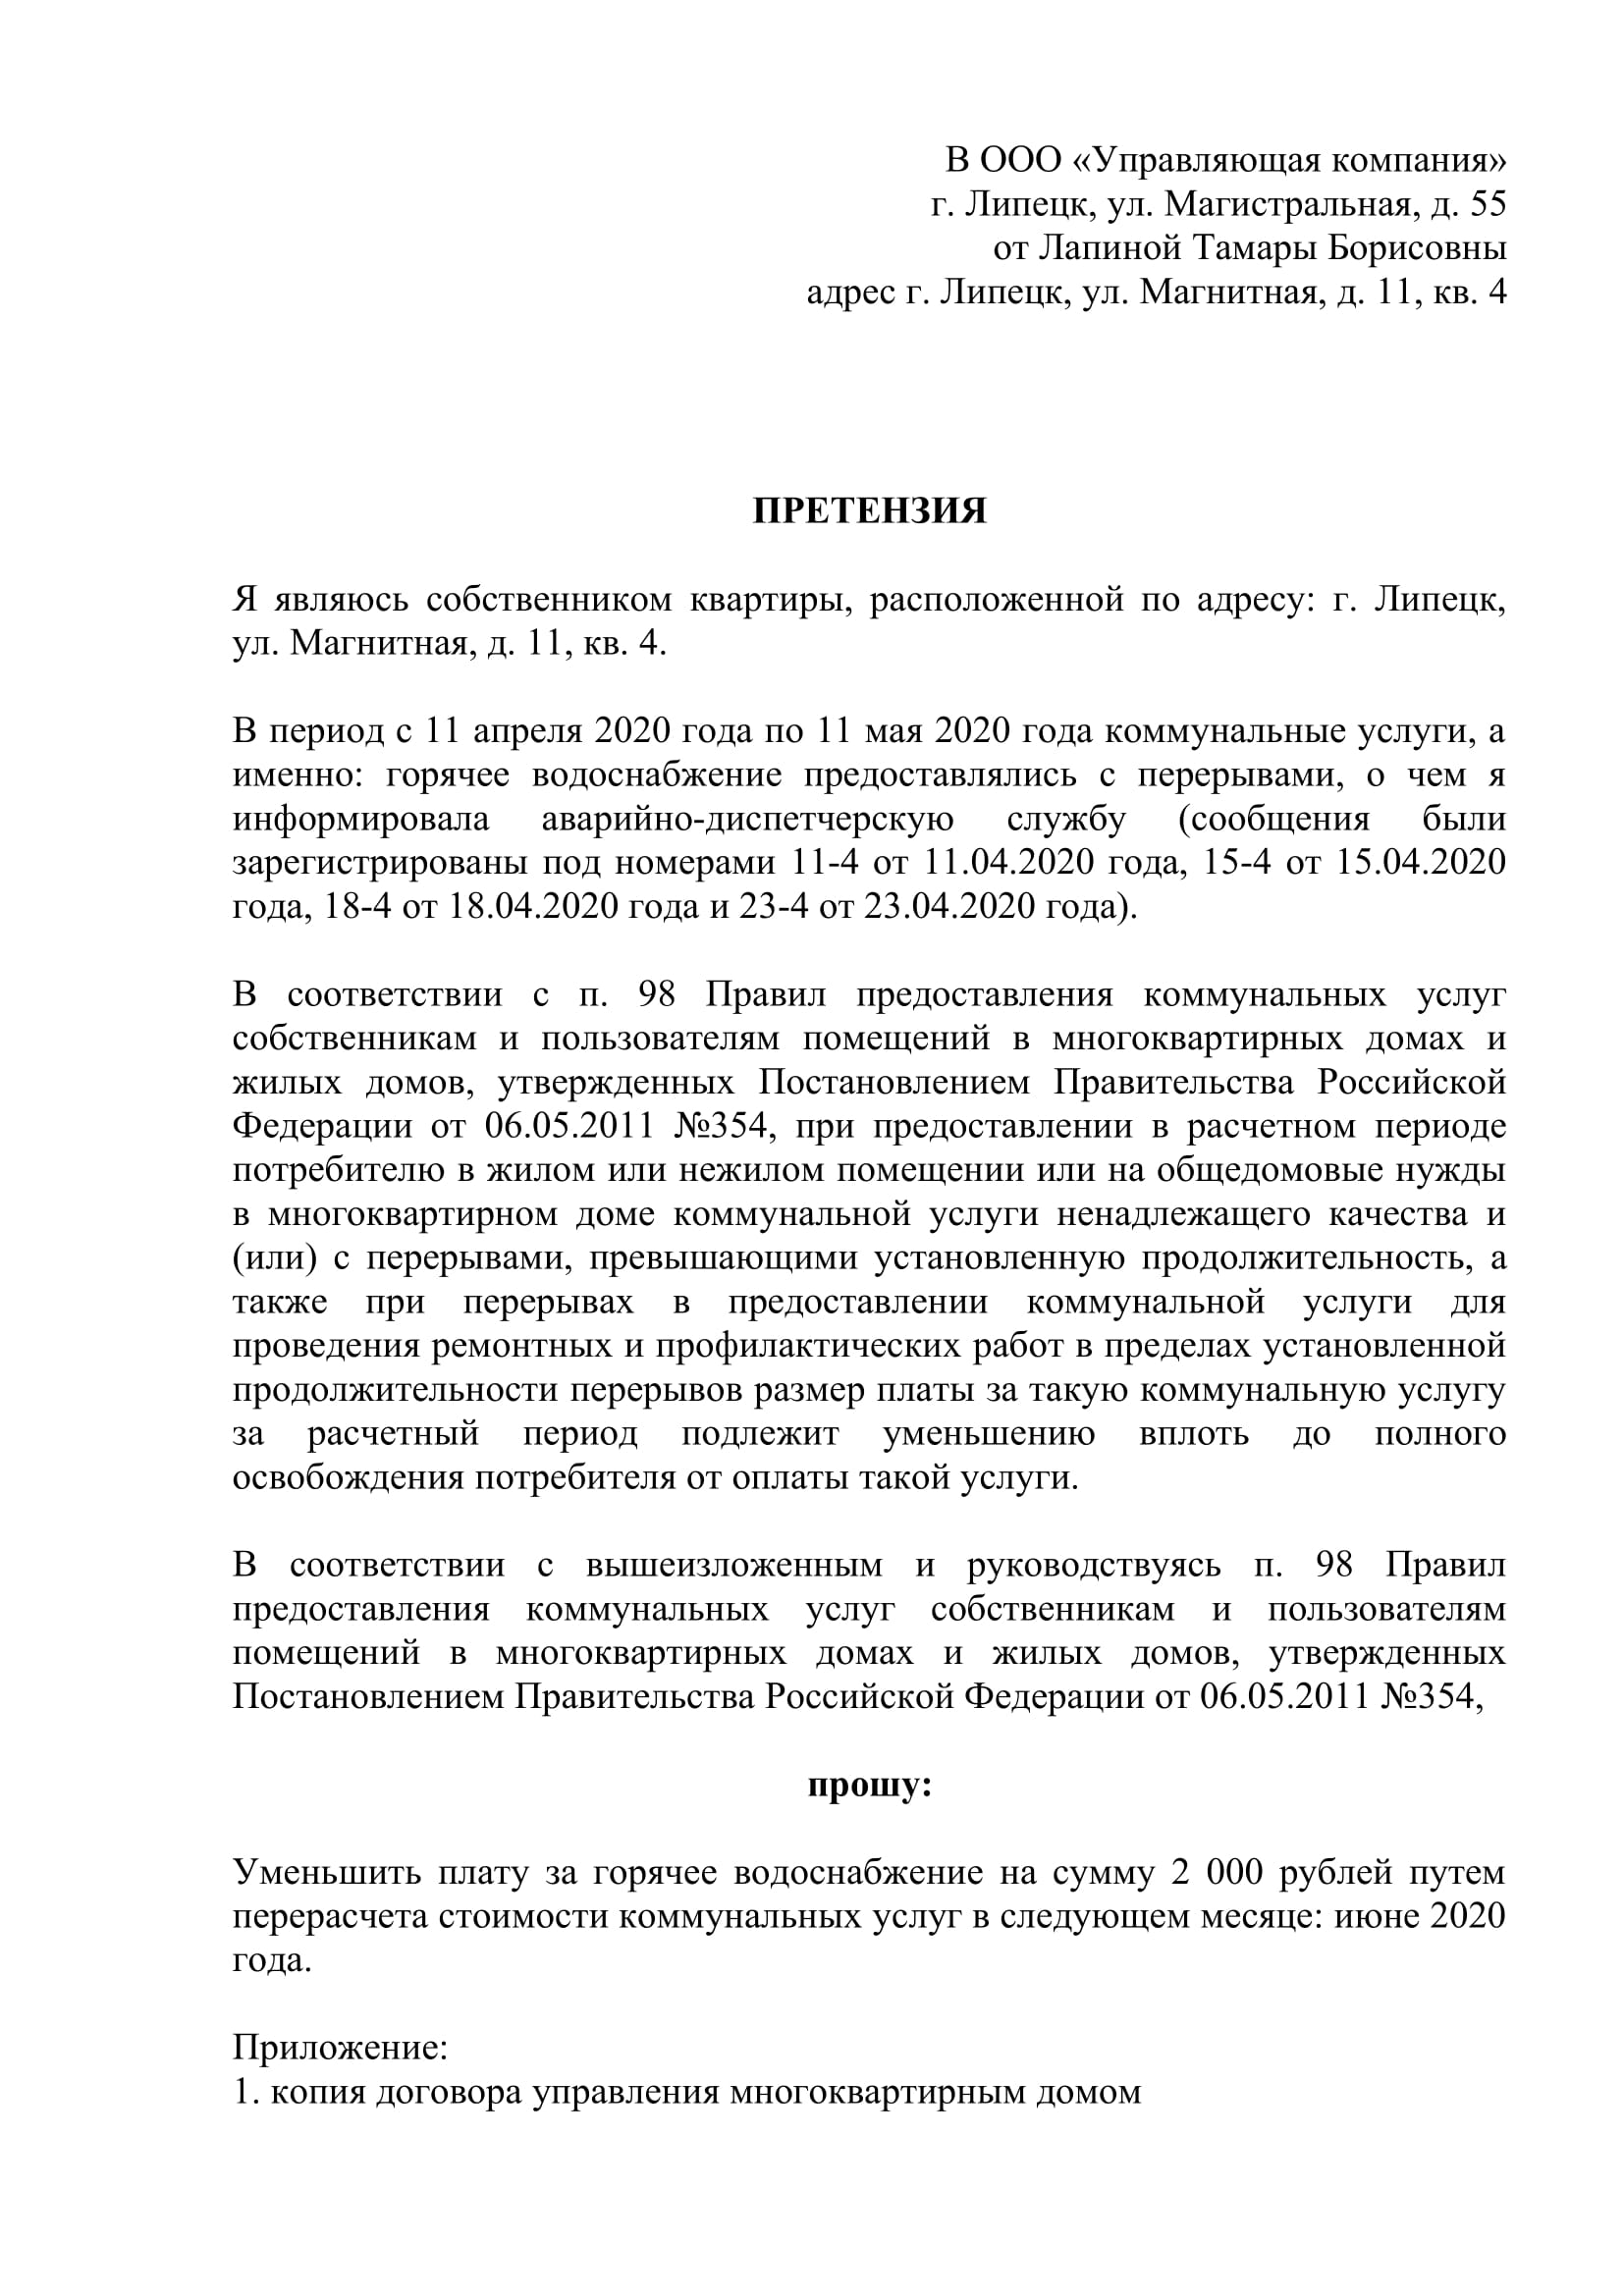 Налог на имущество юридических лиц в москве